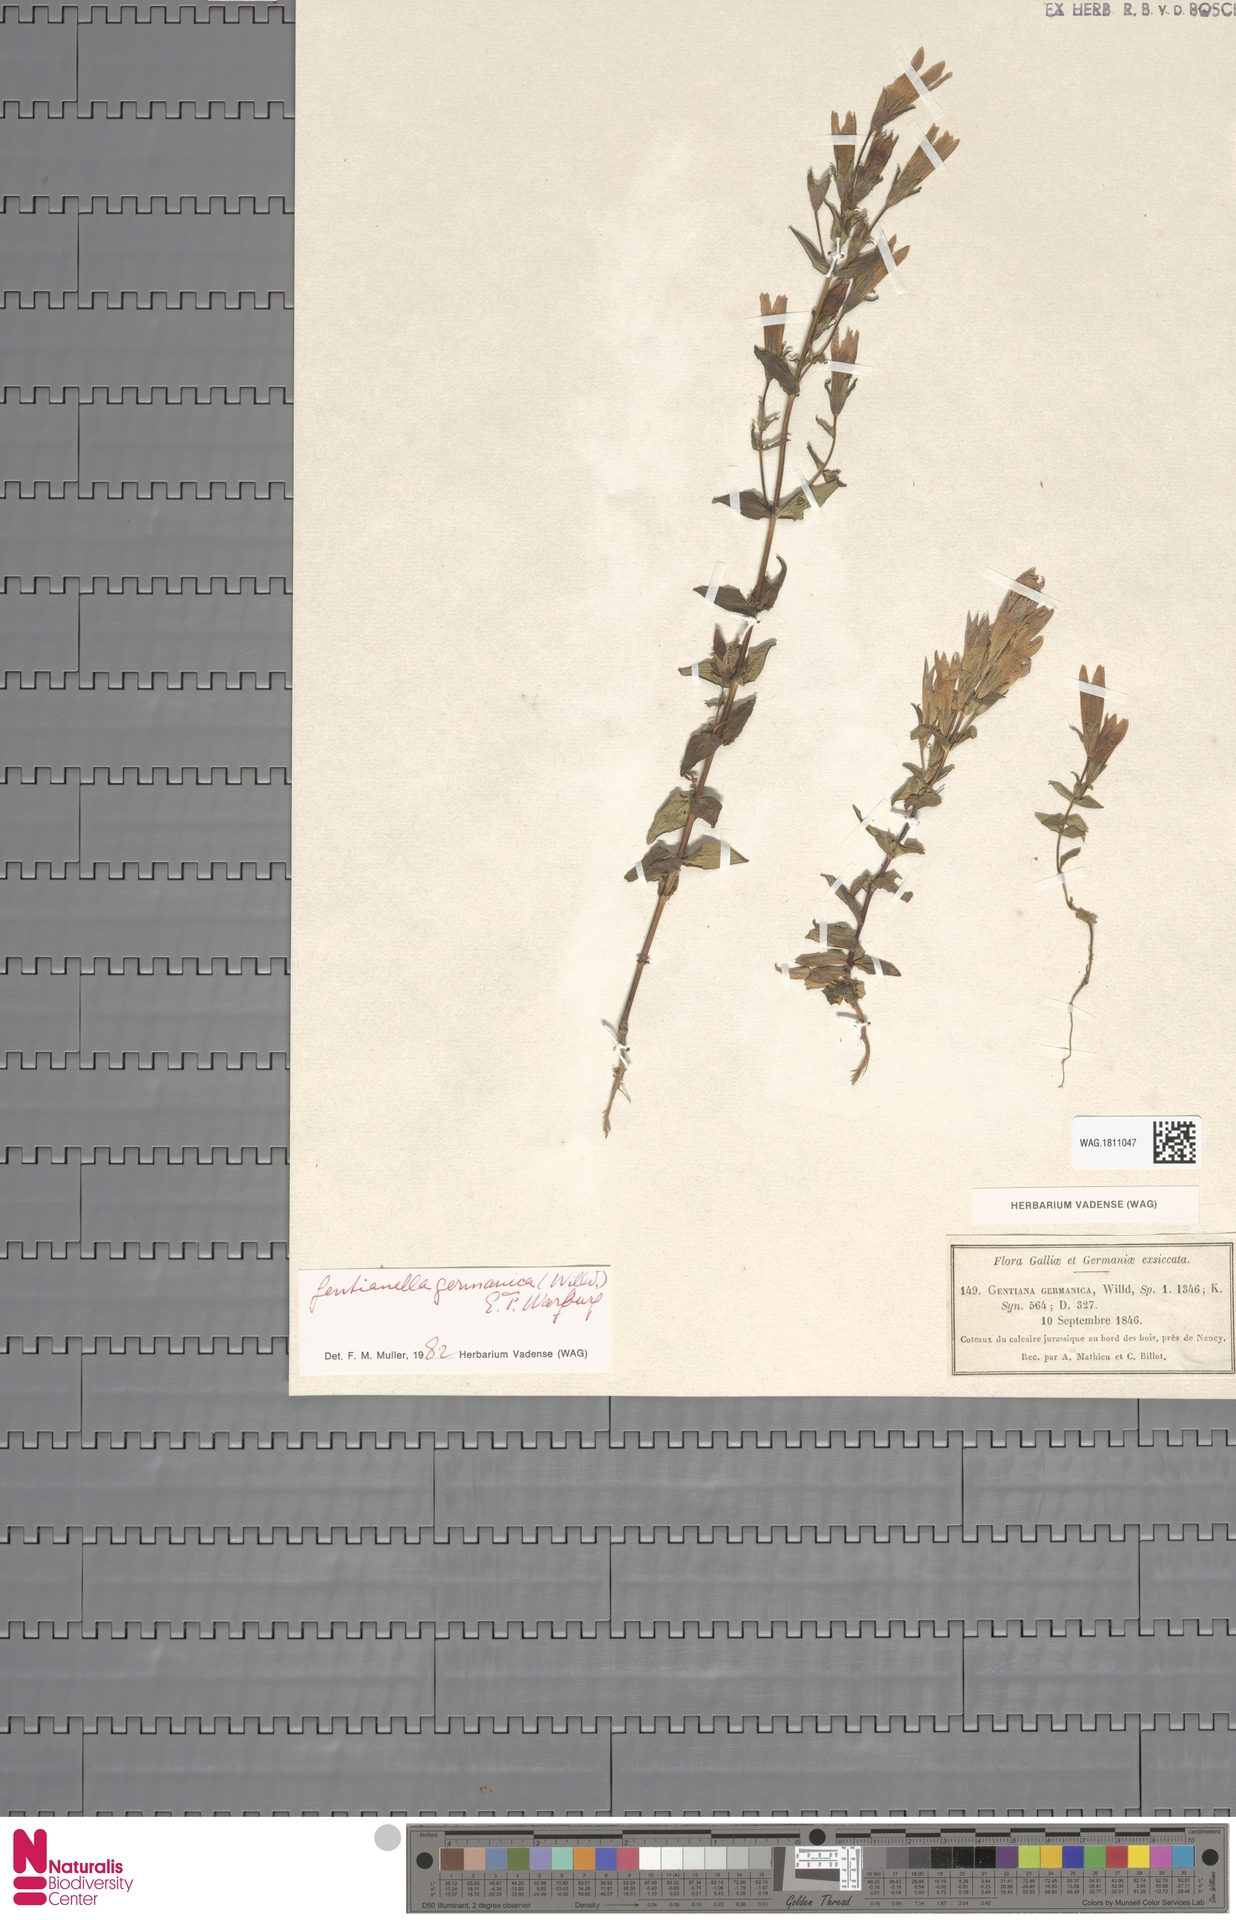 WAG.1811047 | Gentianella germanica (Willd.) E.F.Warb.